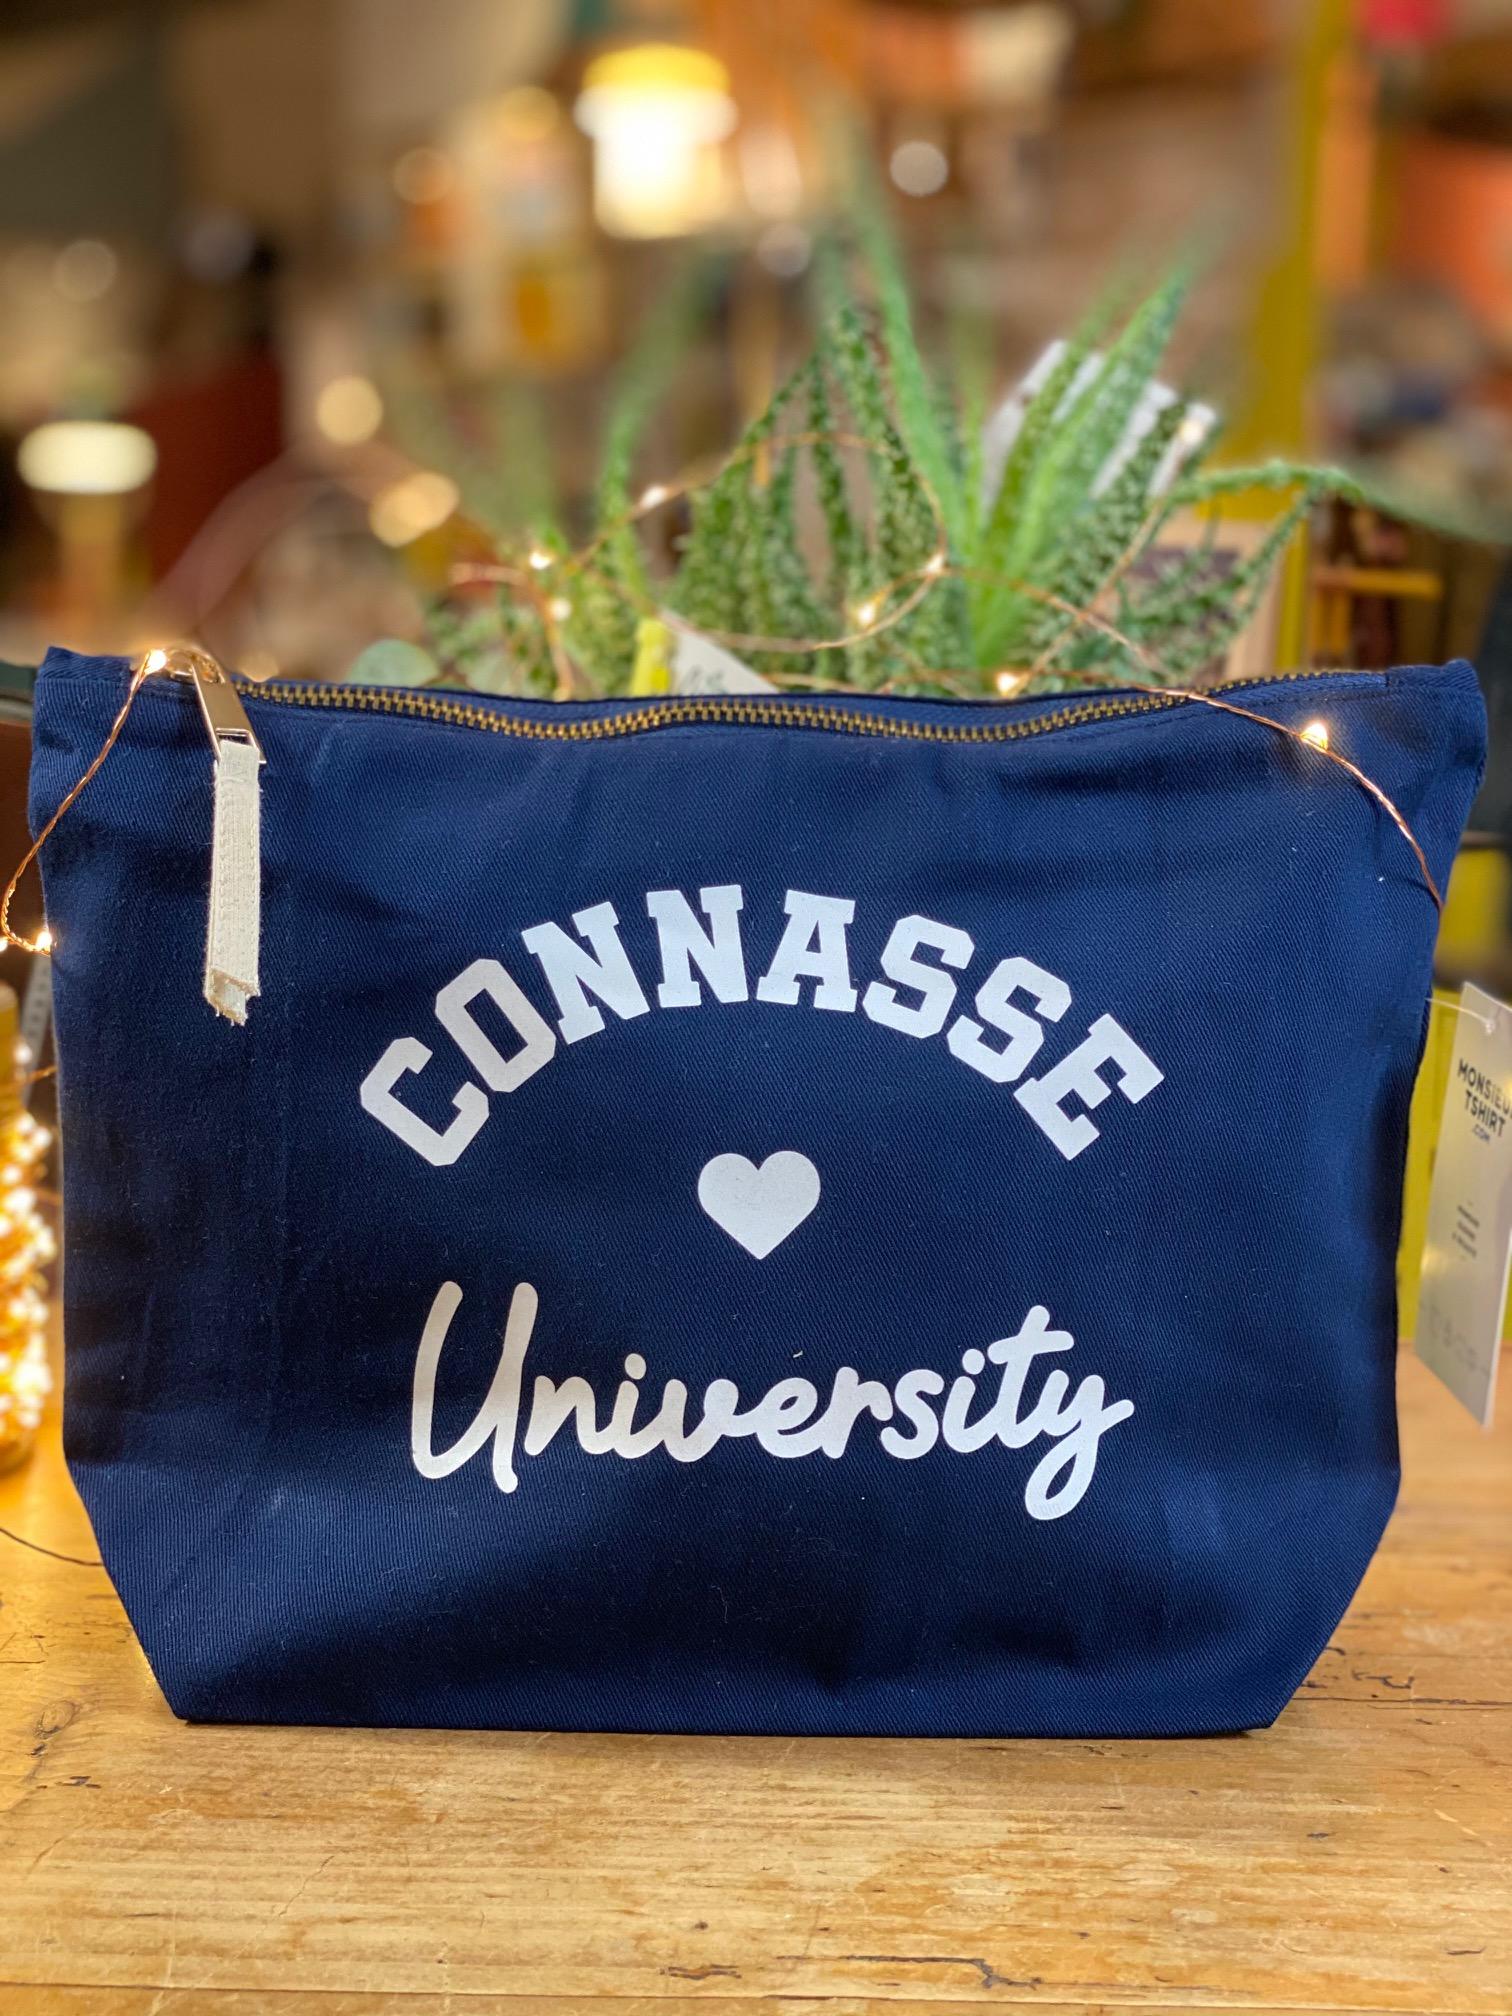 Trousse Connasse University